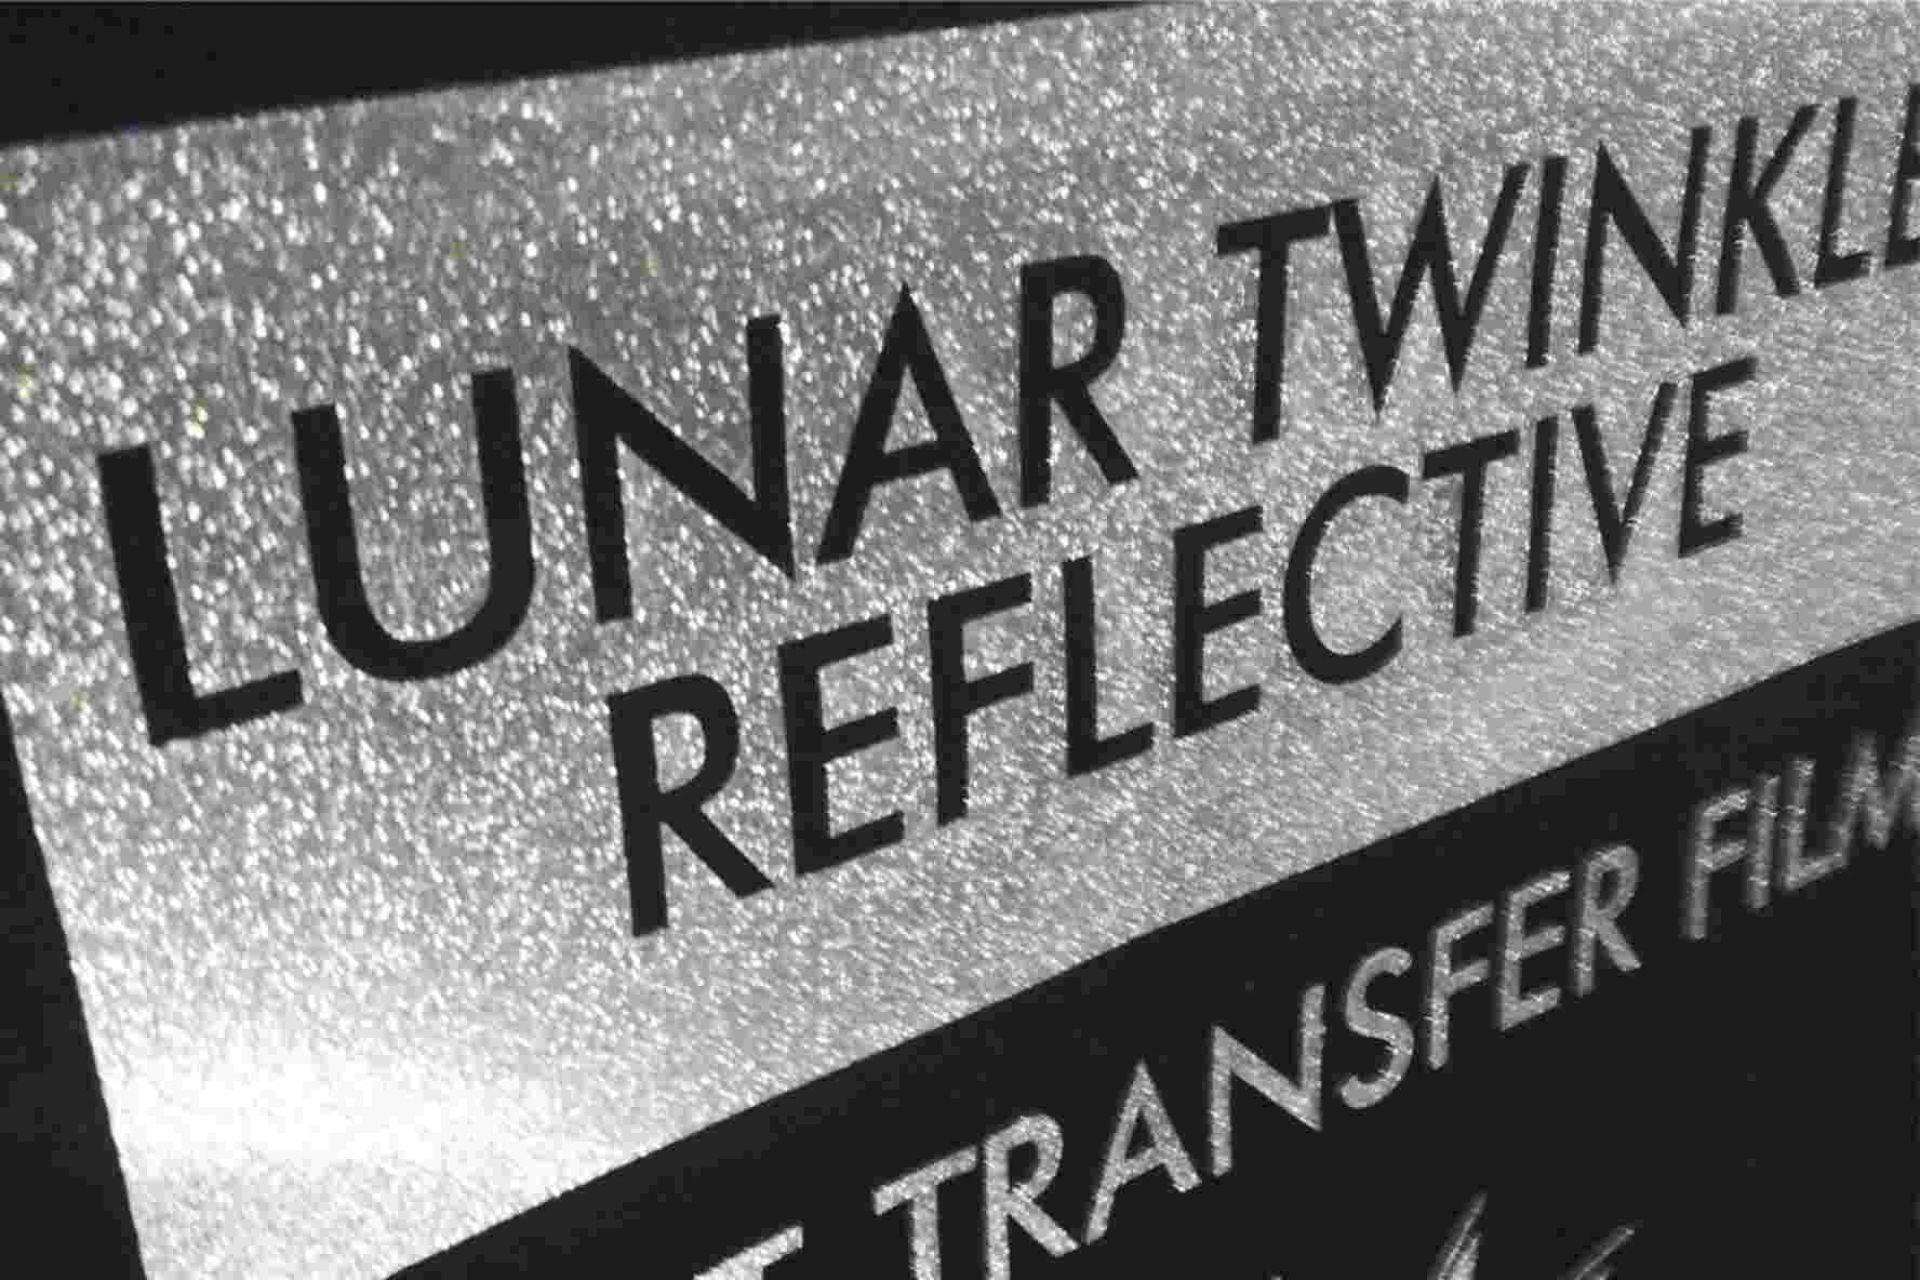 LUNAR TWINKLE REFLECTIVE